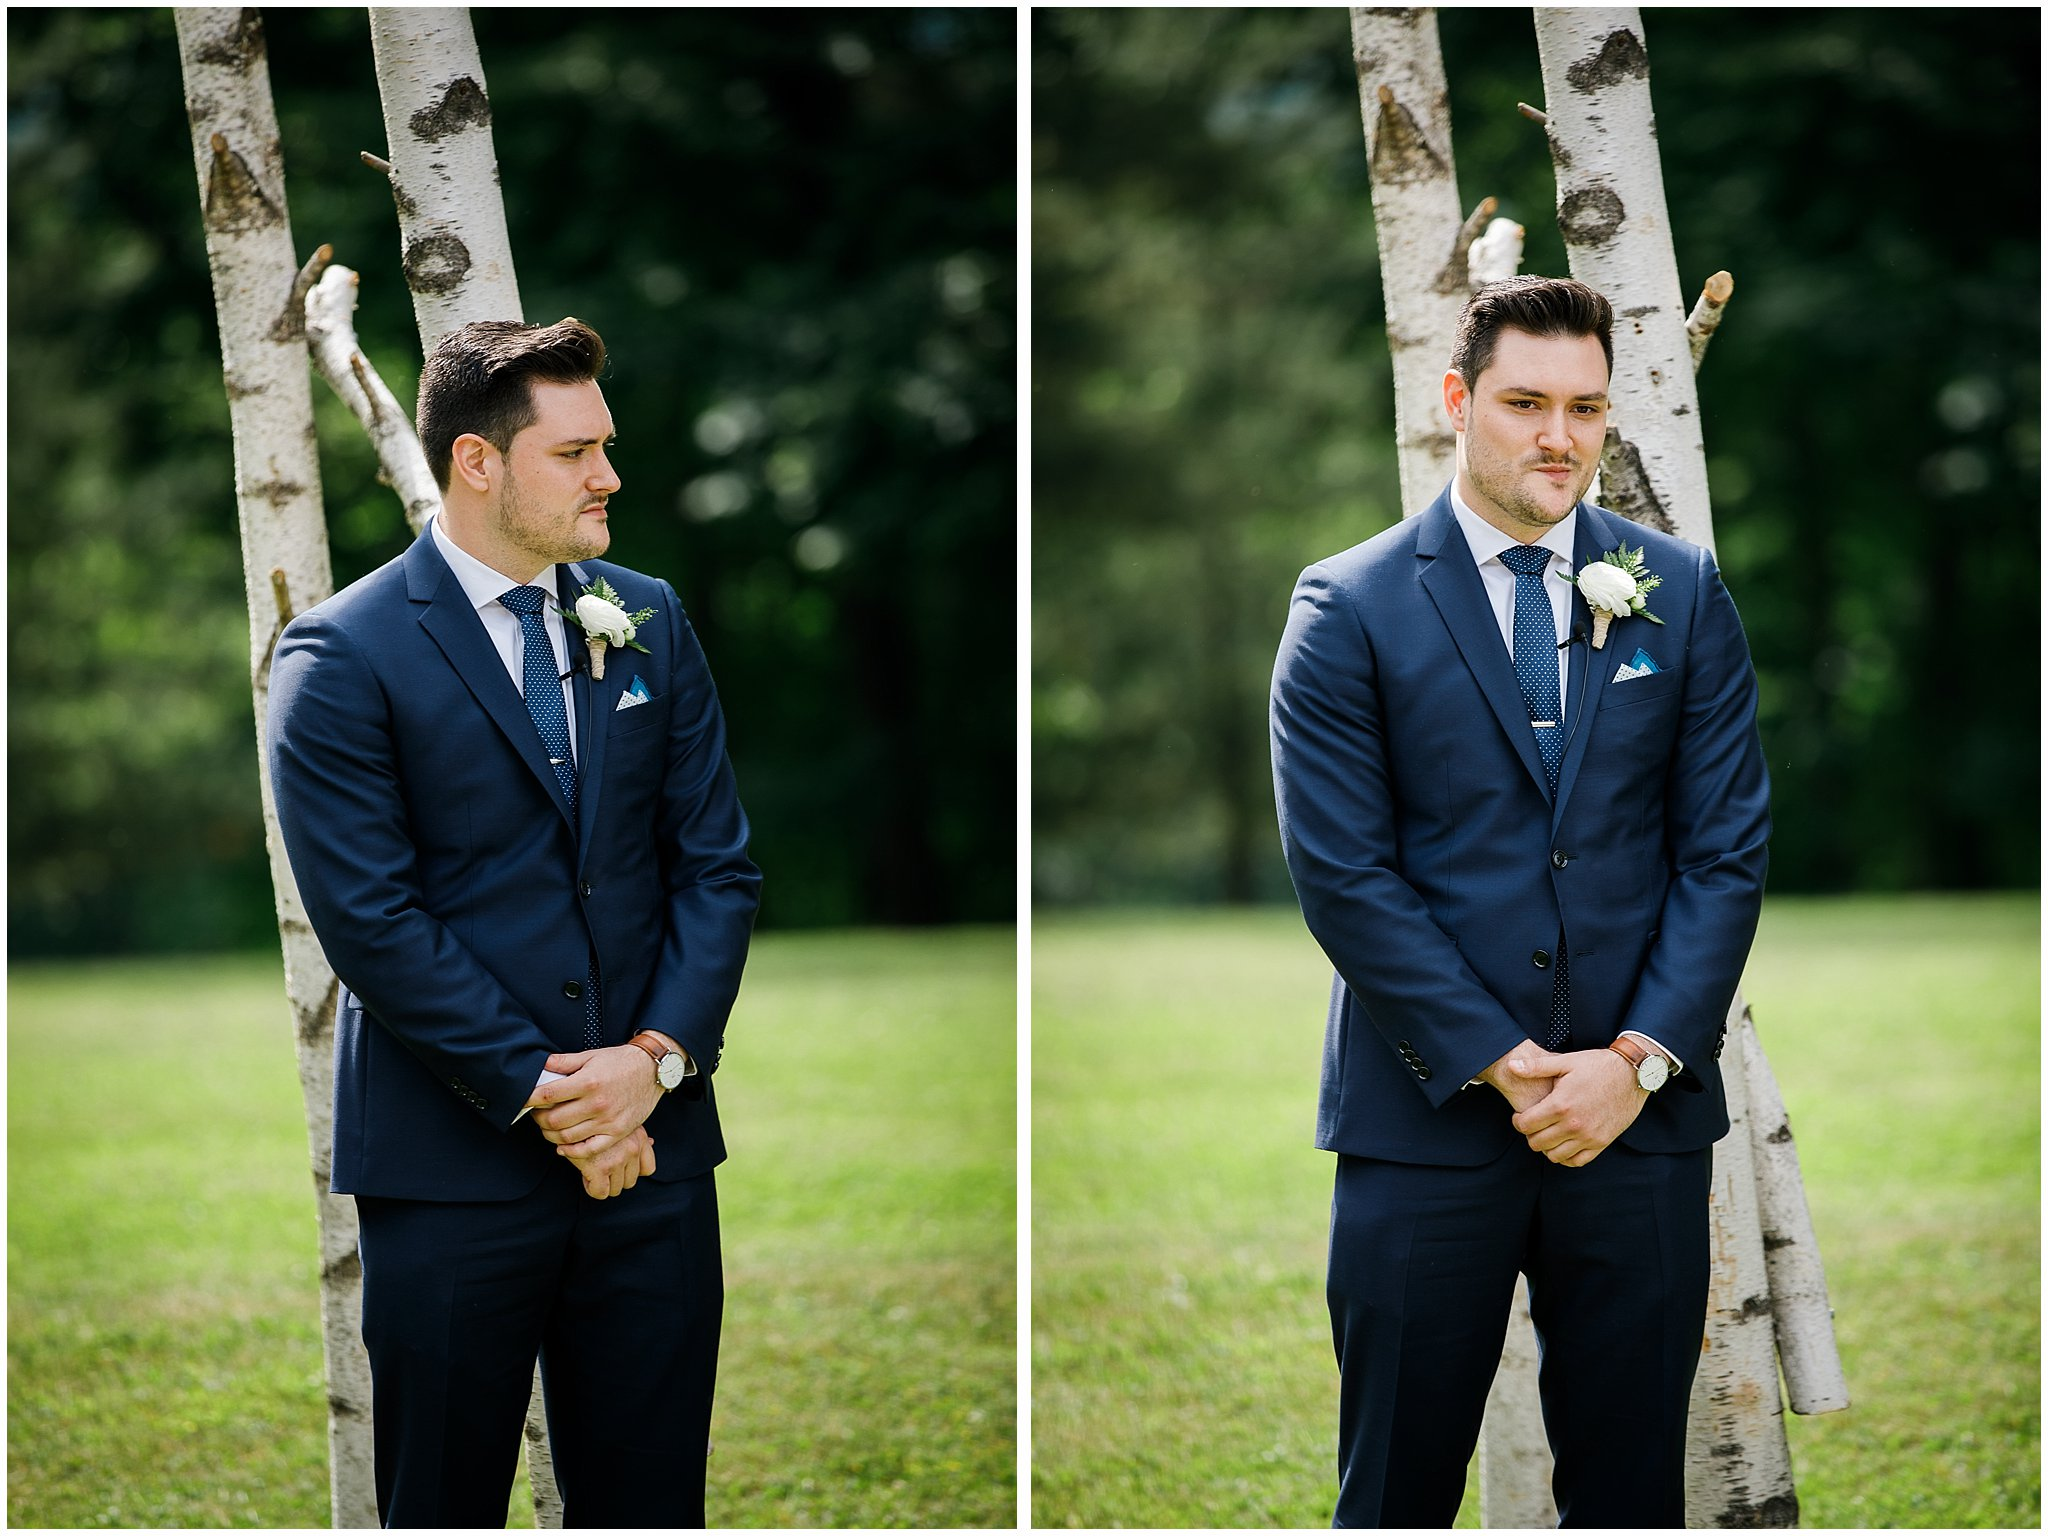 Hudson Valley Weddings at the Hill Hudson New York Wedding Photographer40.jpg